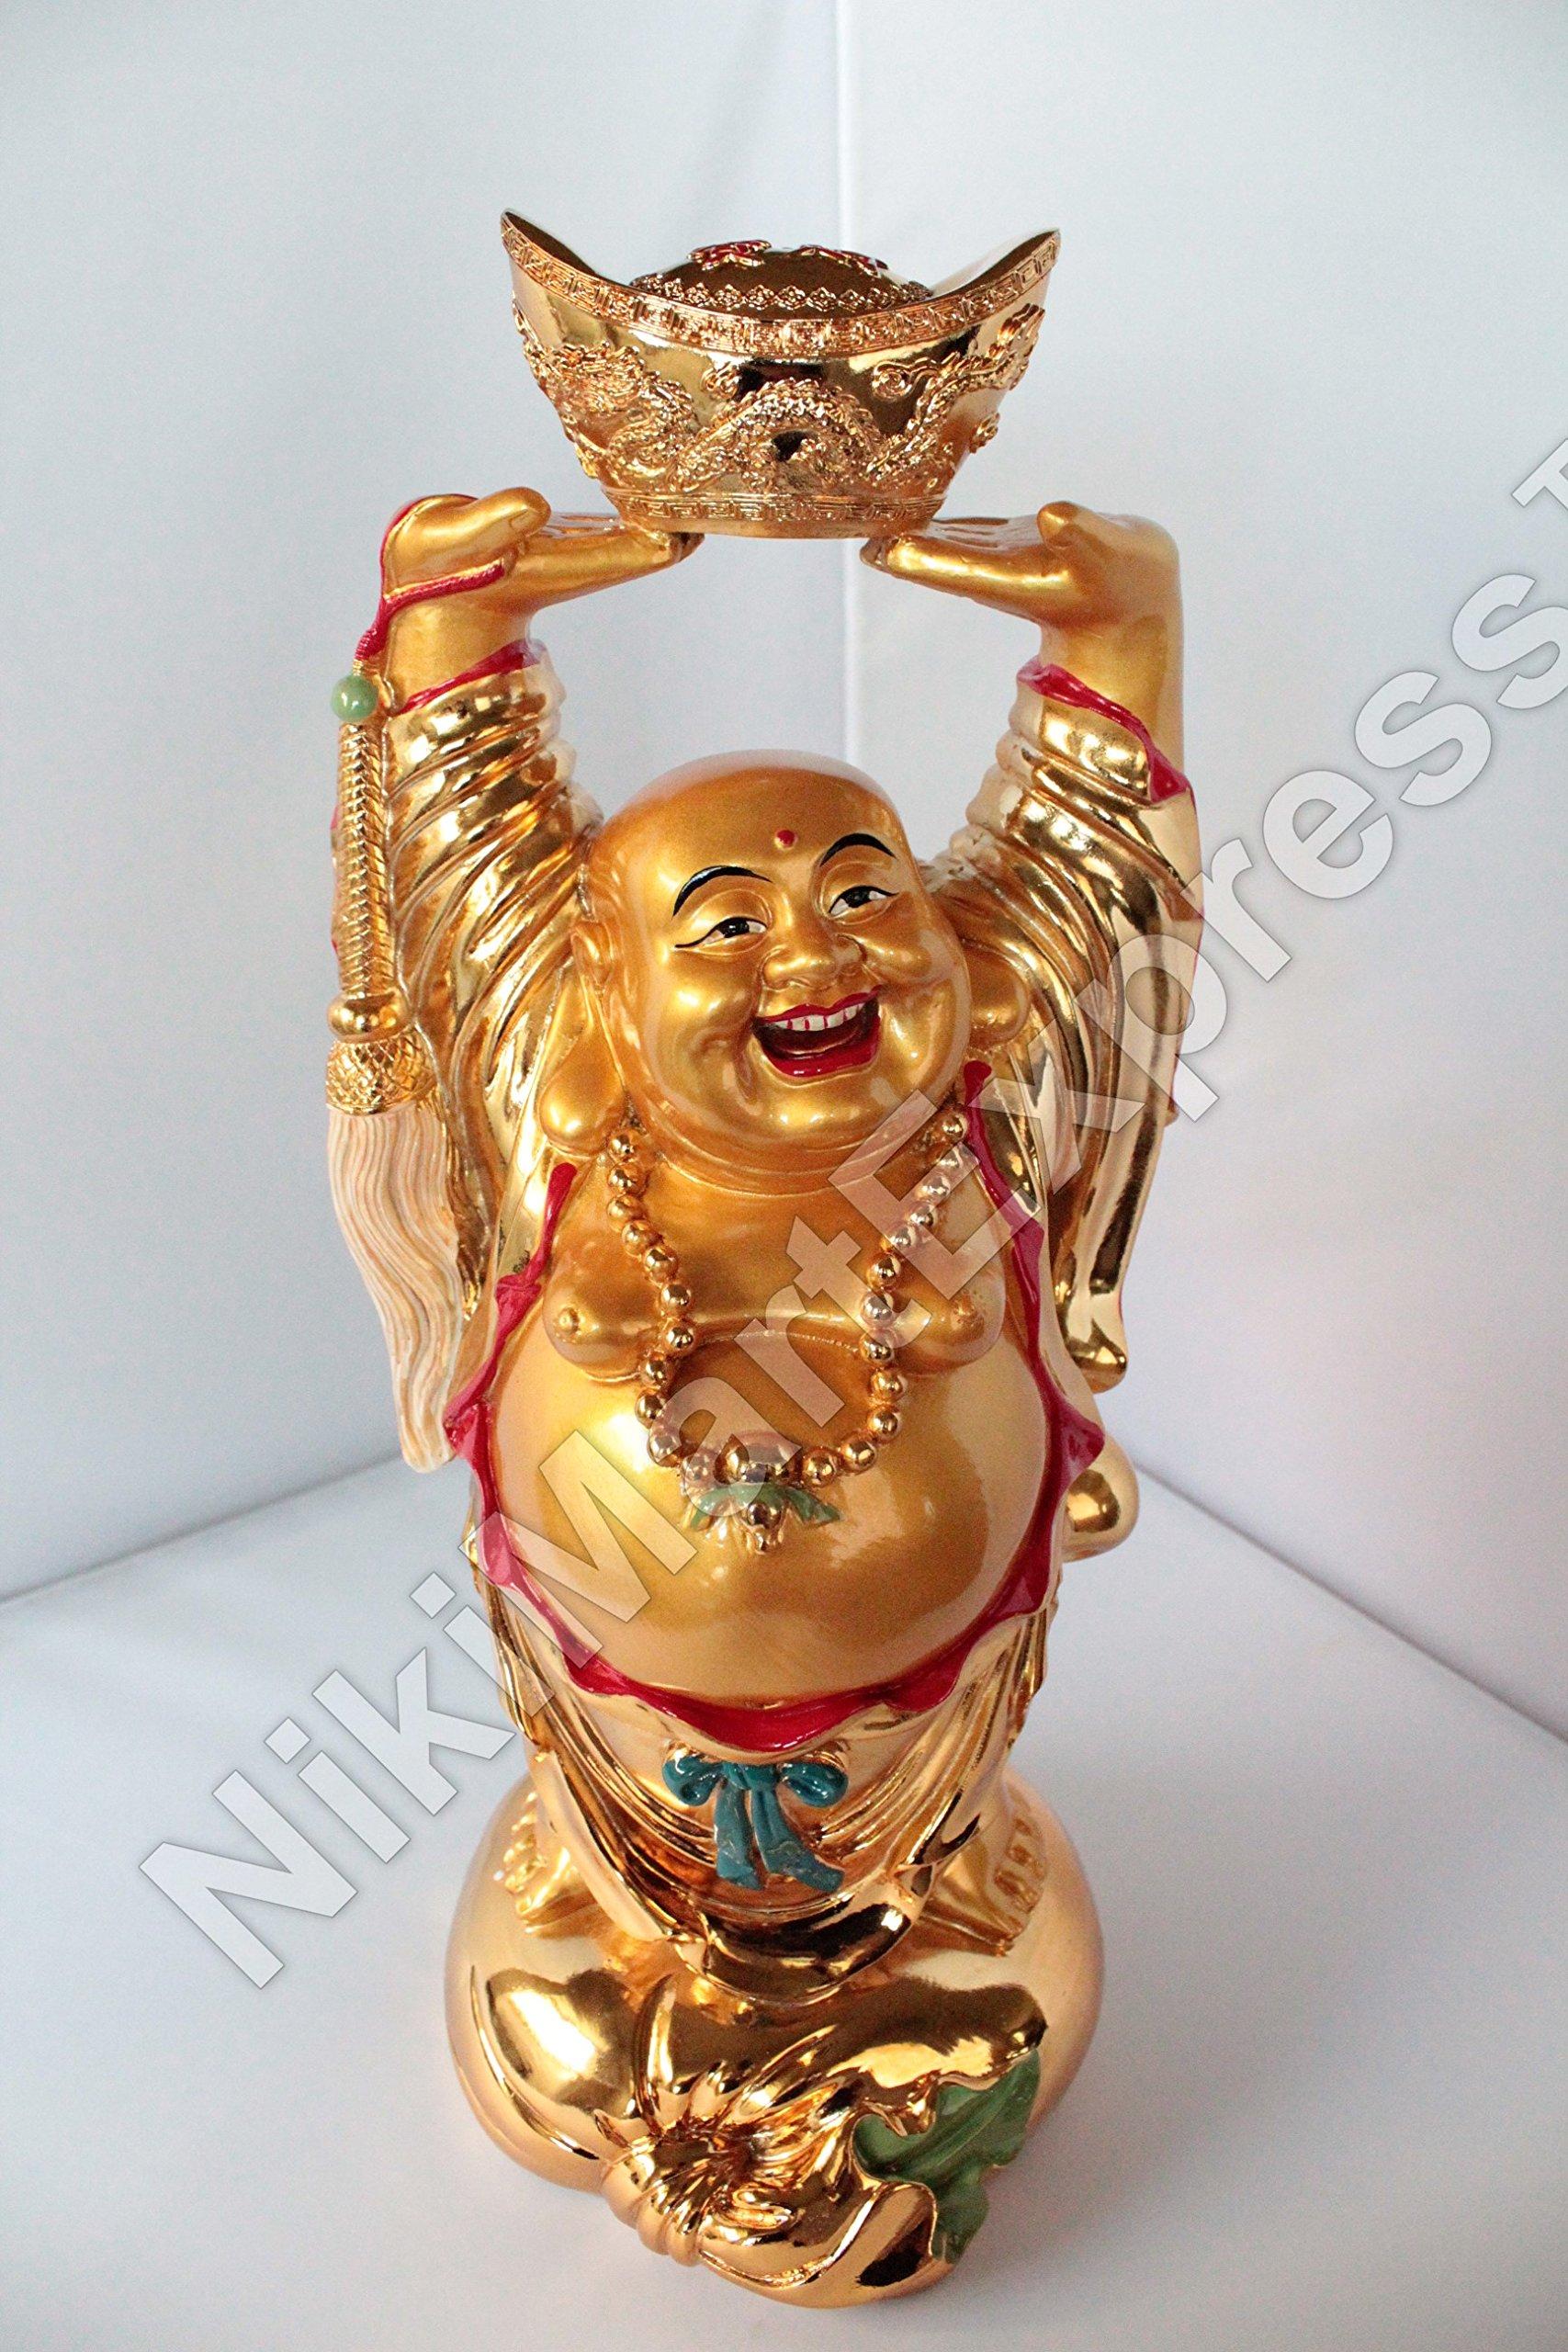 18'' Huge Golden Chinese Feng Shui Love Happiness Longevity Wealth Happy Laughing Buddha w Gold Ingot